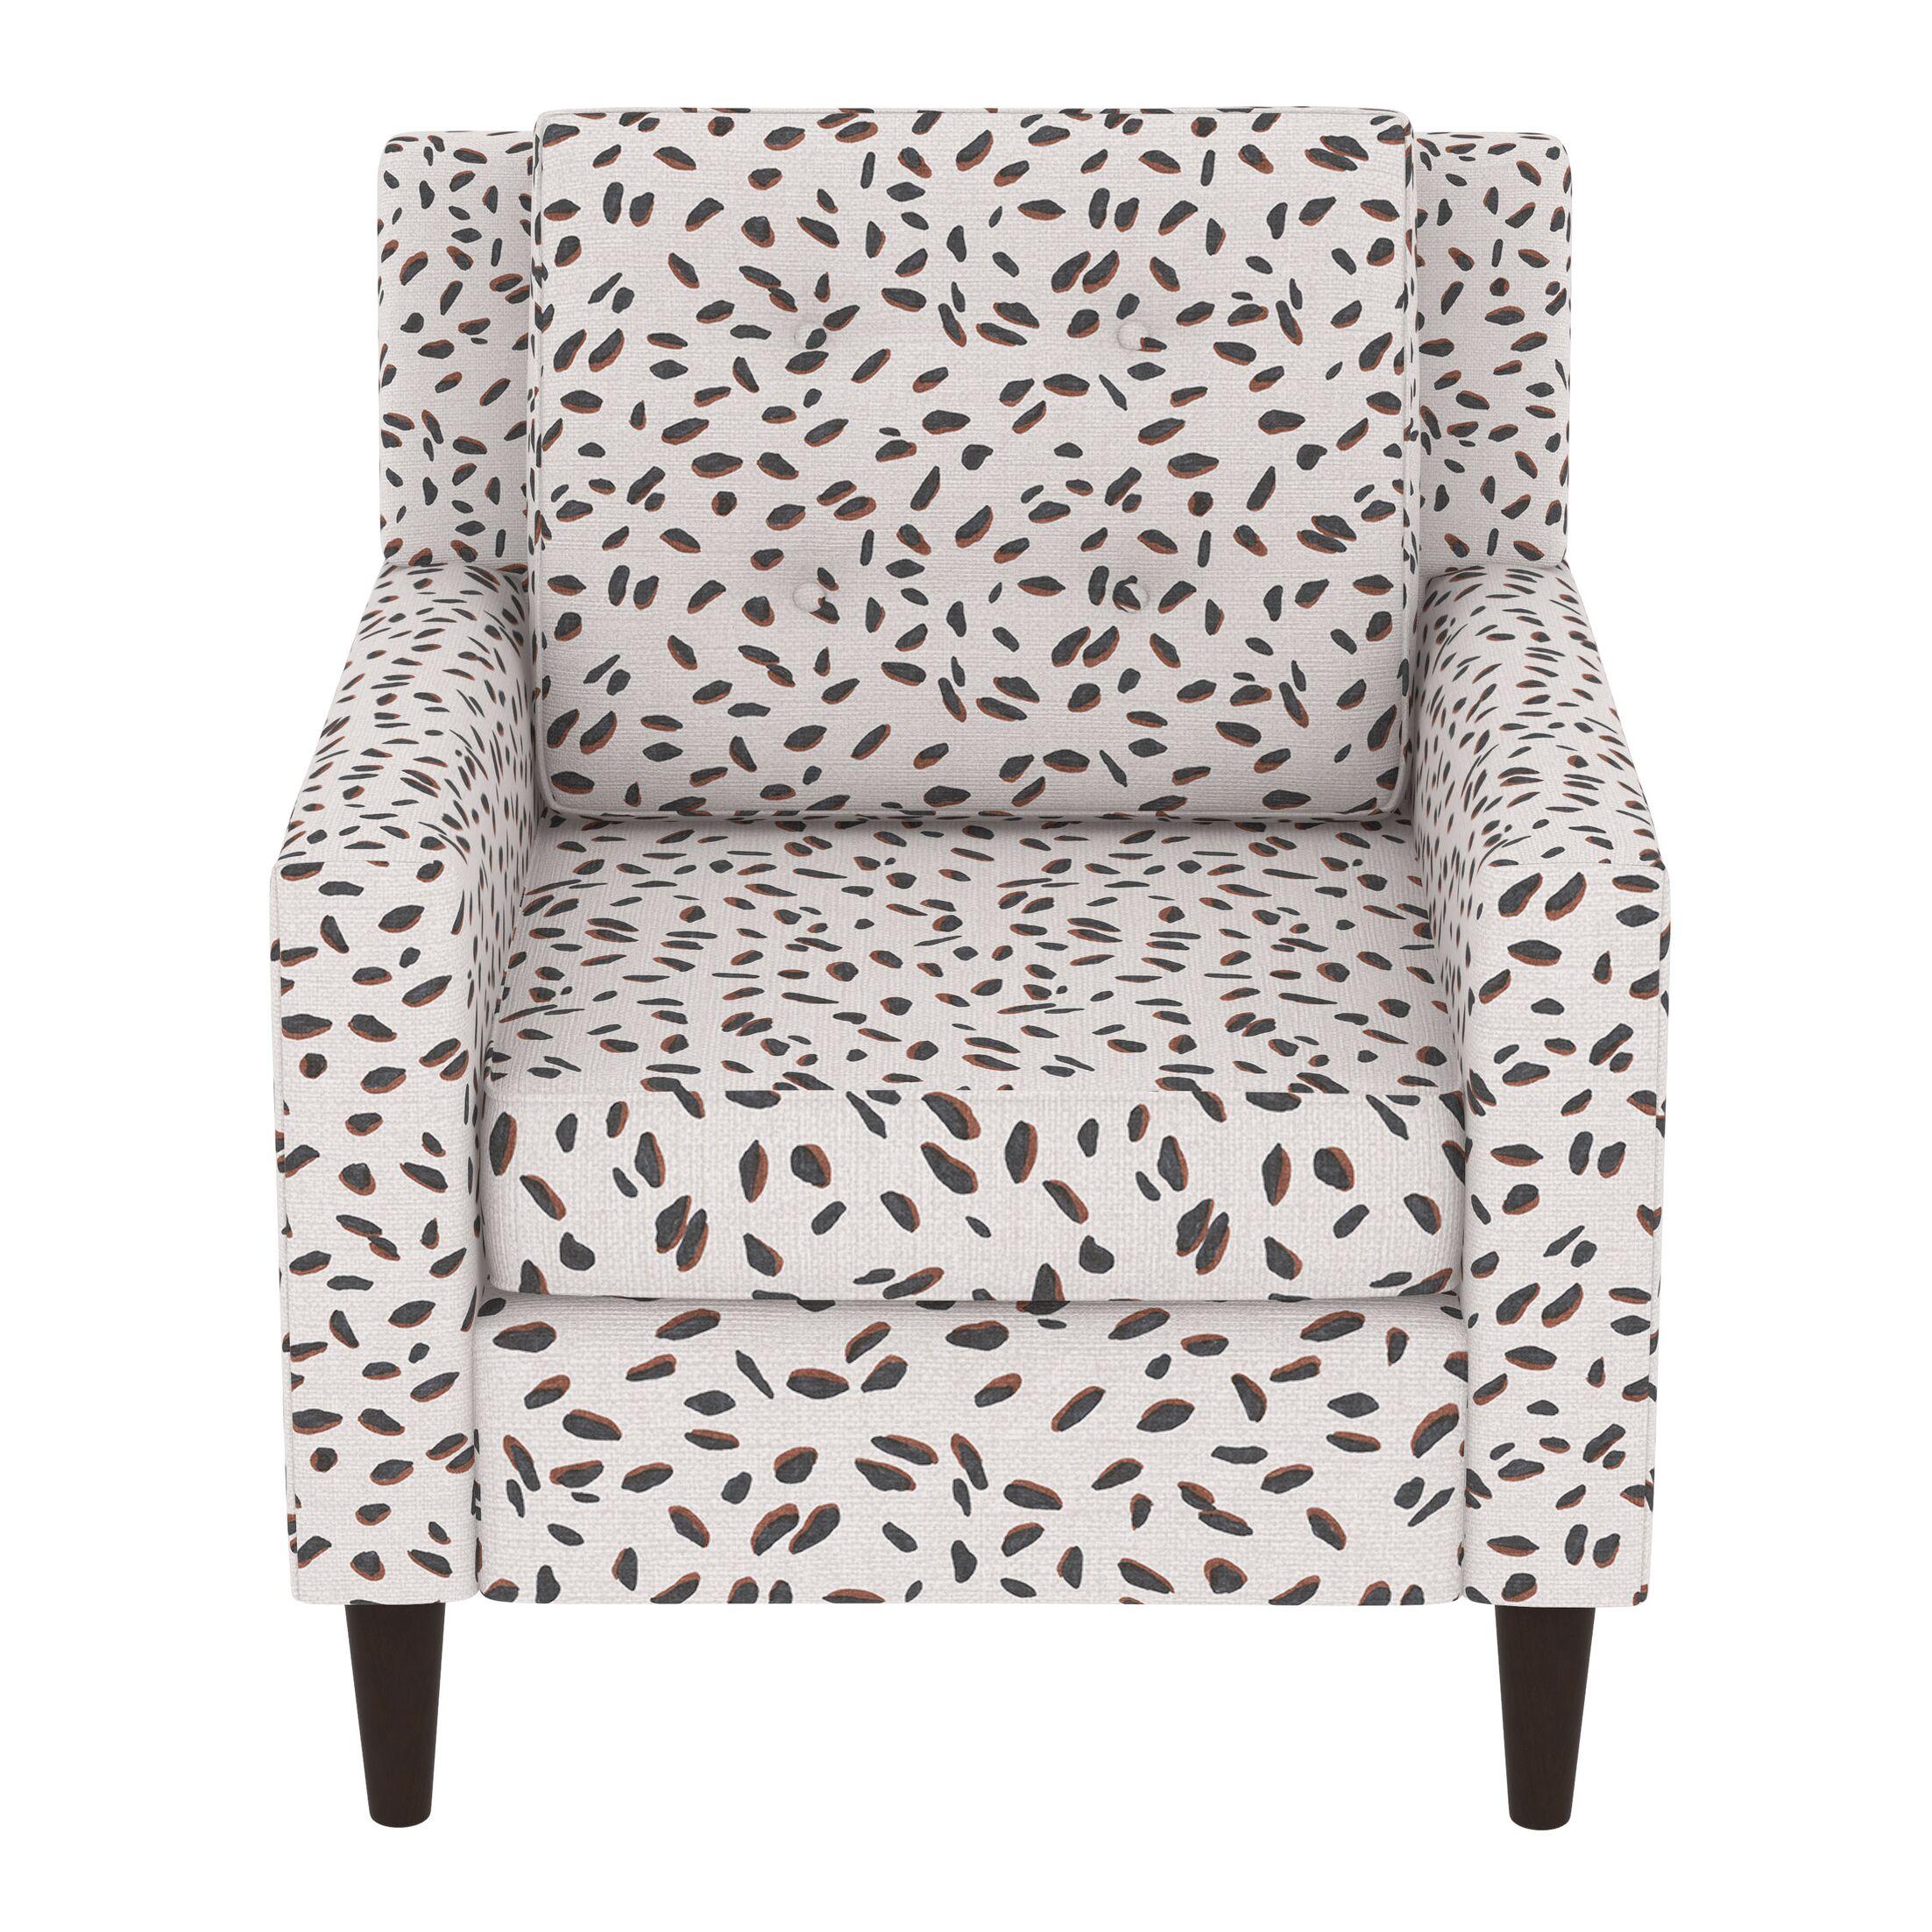 Greer Adobe Armchair Upholstery: Neo Leo Cream Tan Black OGA